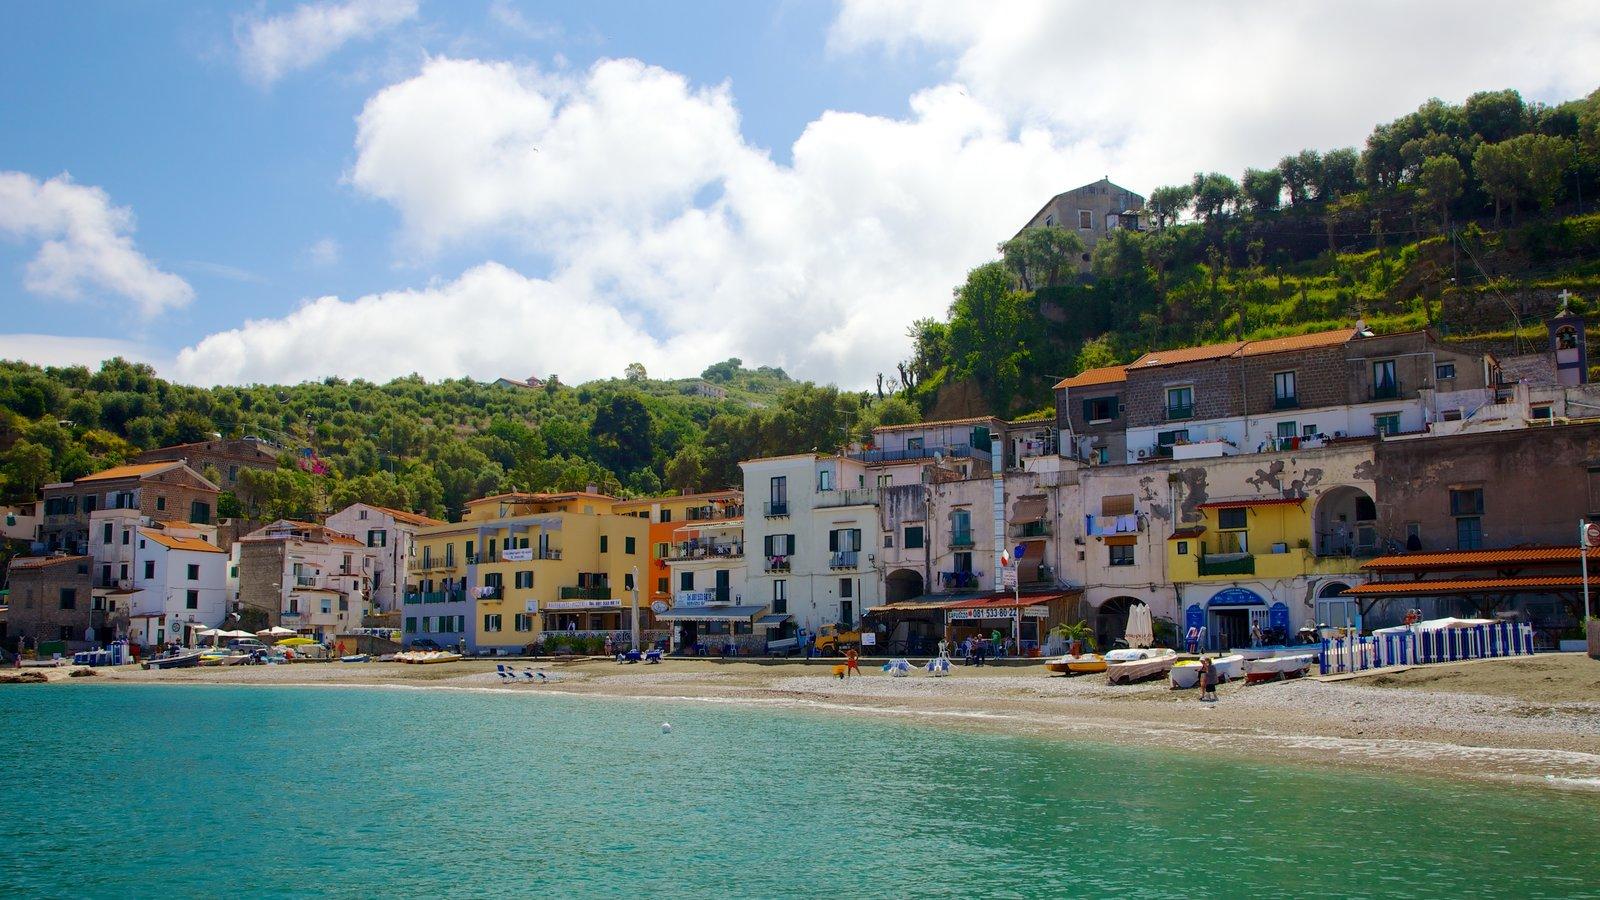 Marina di Puolo showing a sandy beach and a coastal town